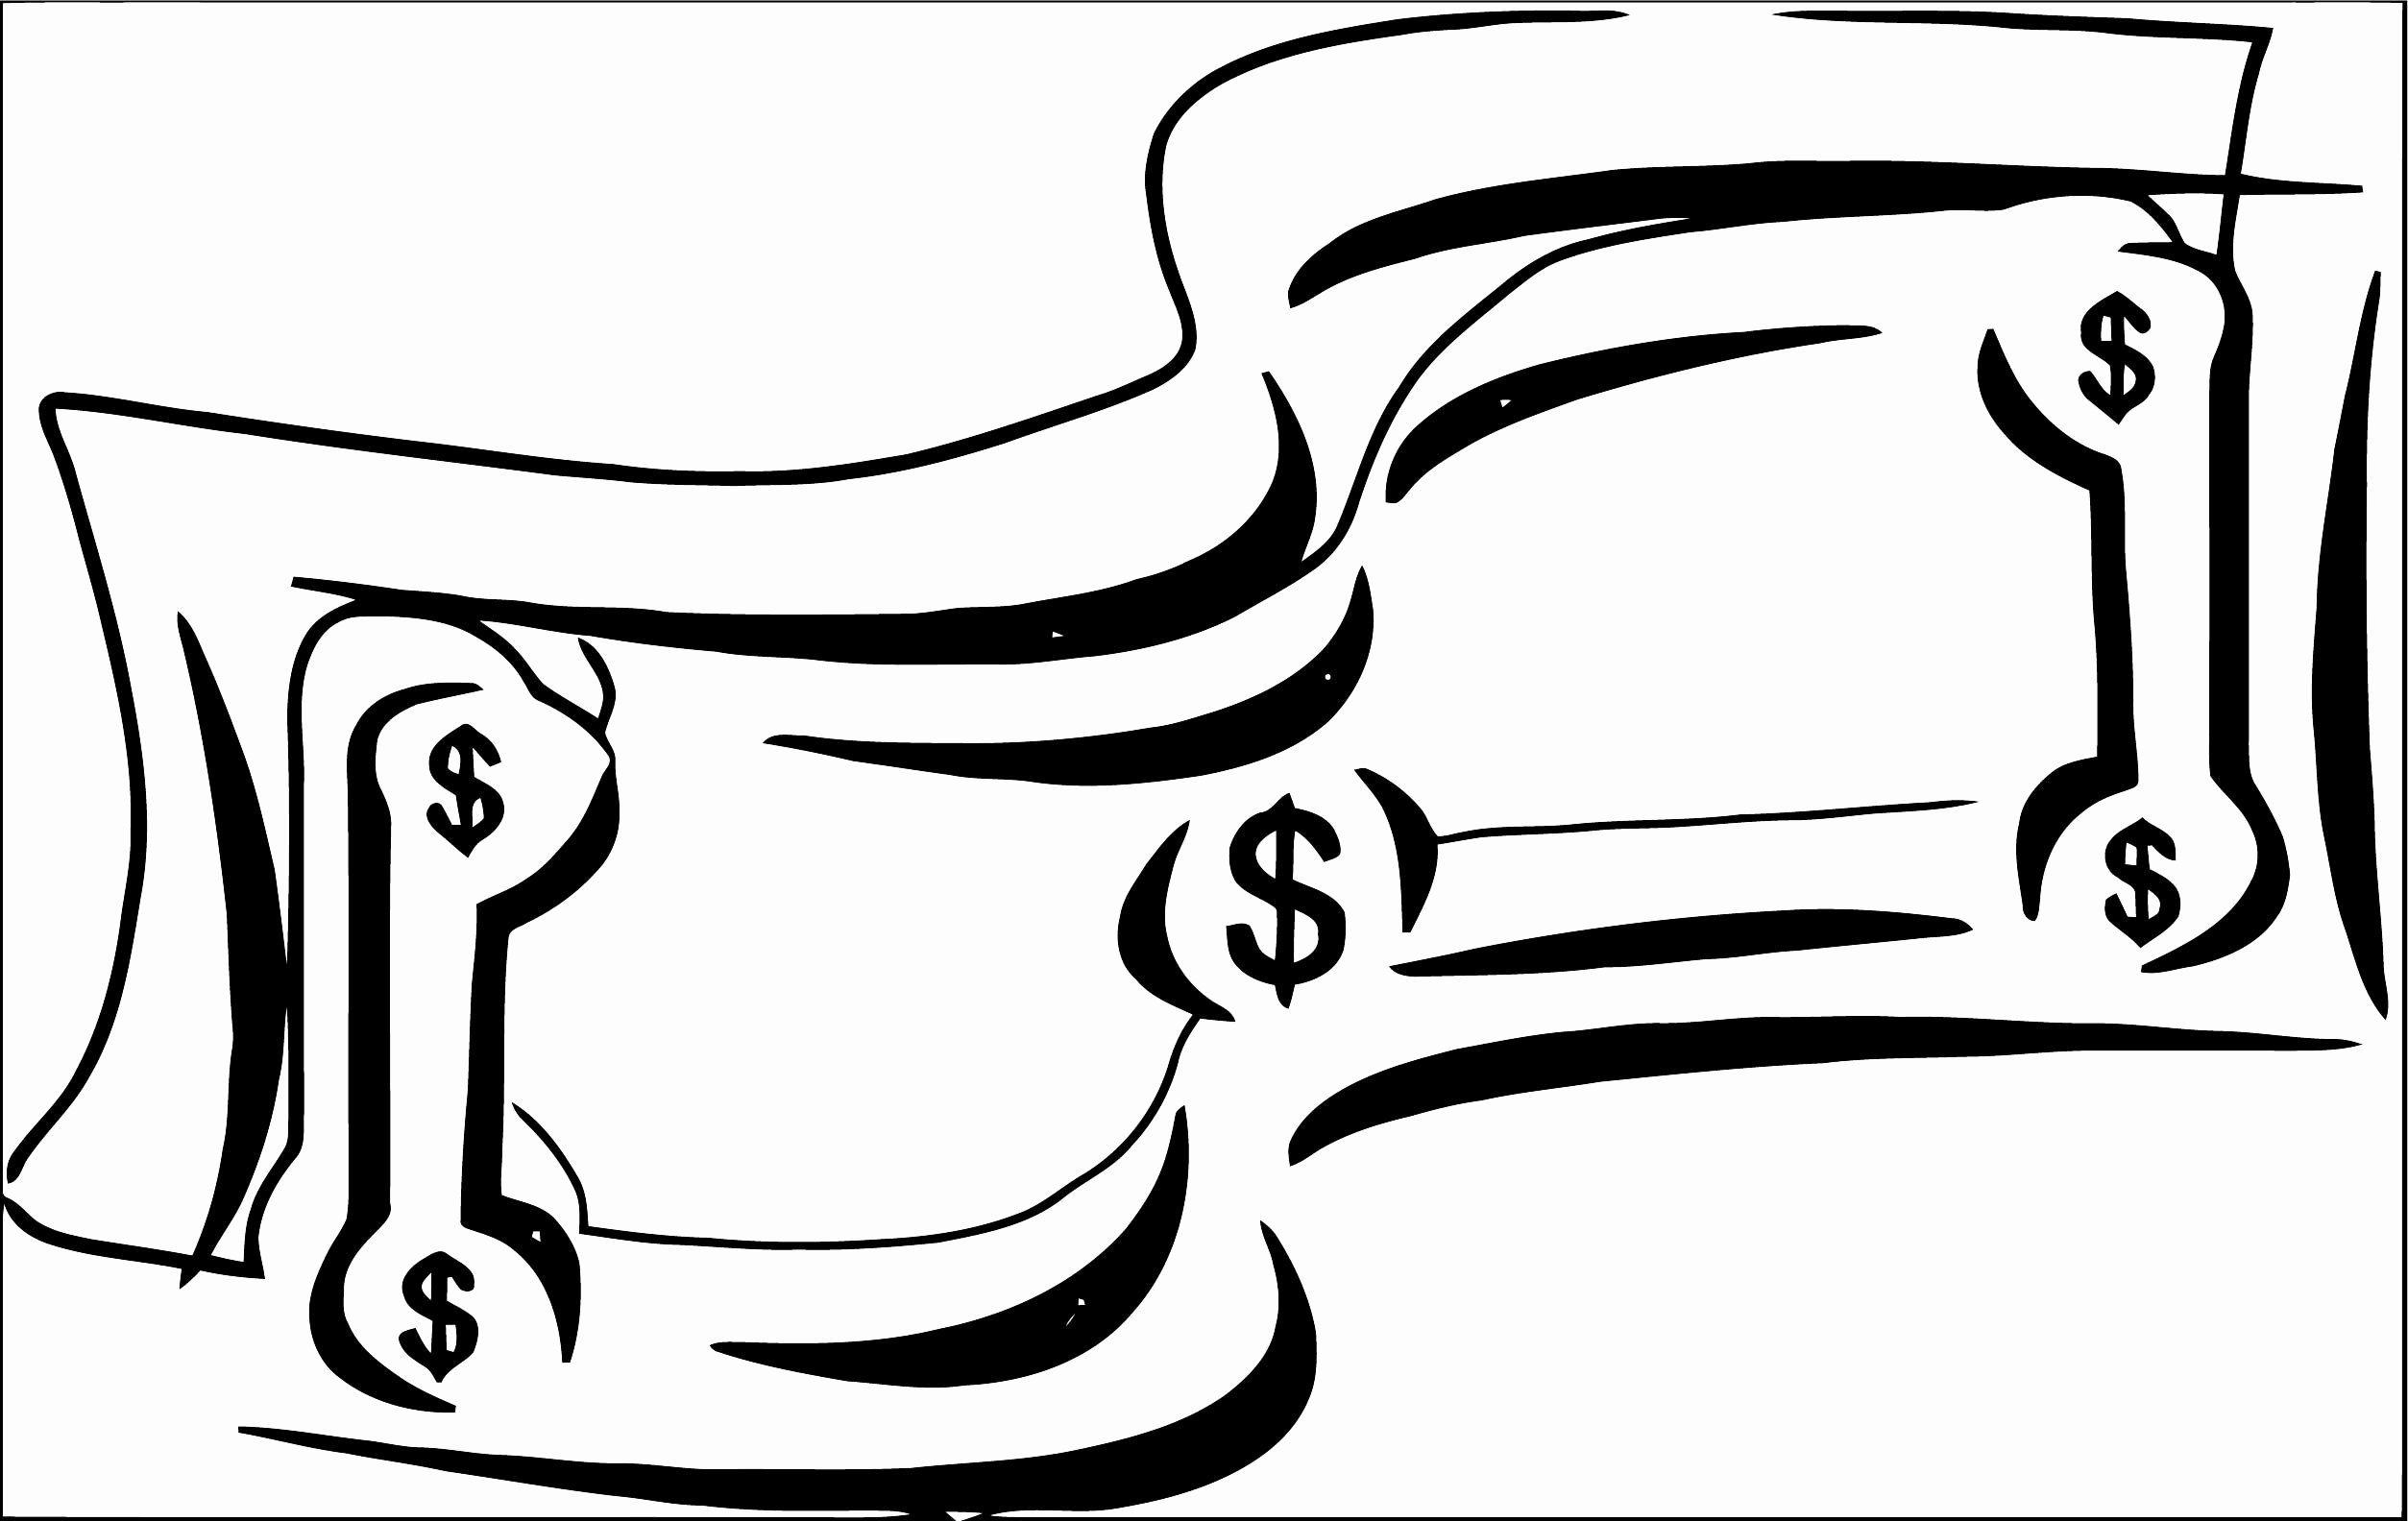 Dollar Bill Coloring Page Fresh Worksheet Dollar Bill Printable Worksheet Fun Worksheet Bank Notes Dollar Banknote Banknotes Money